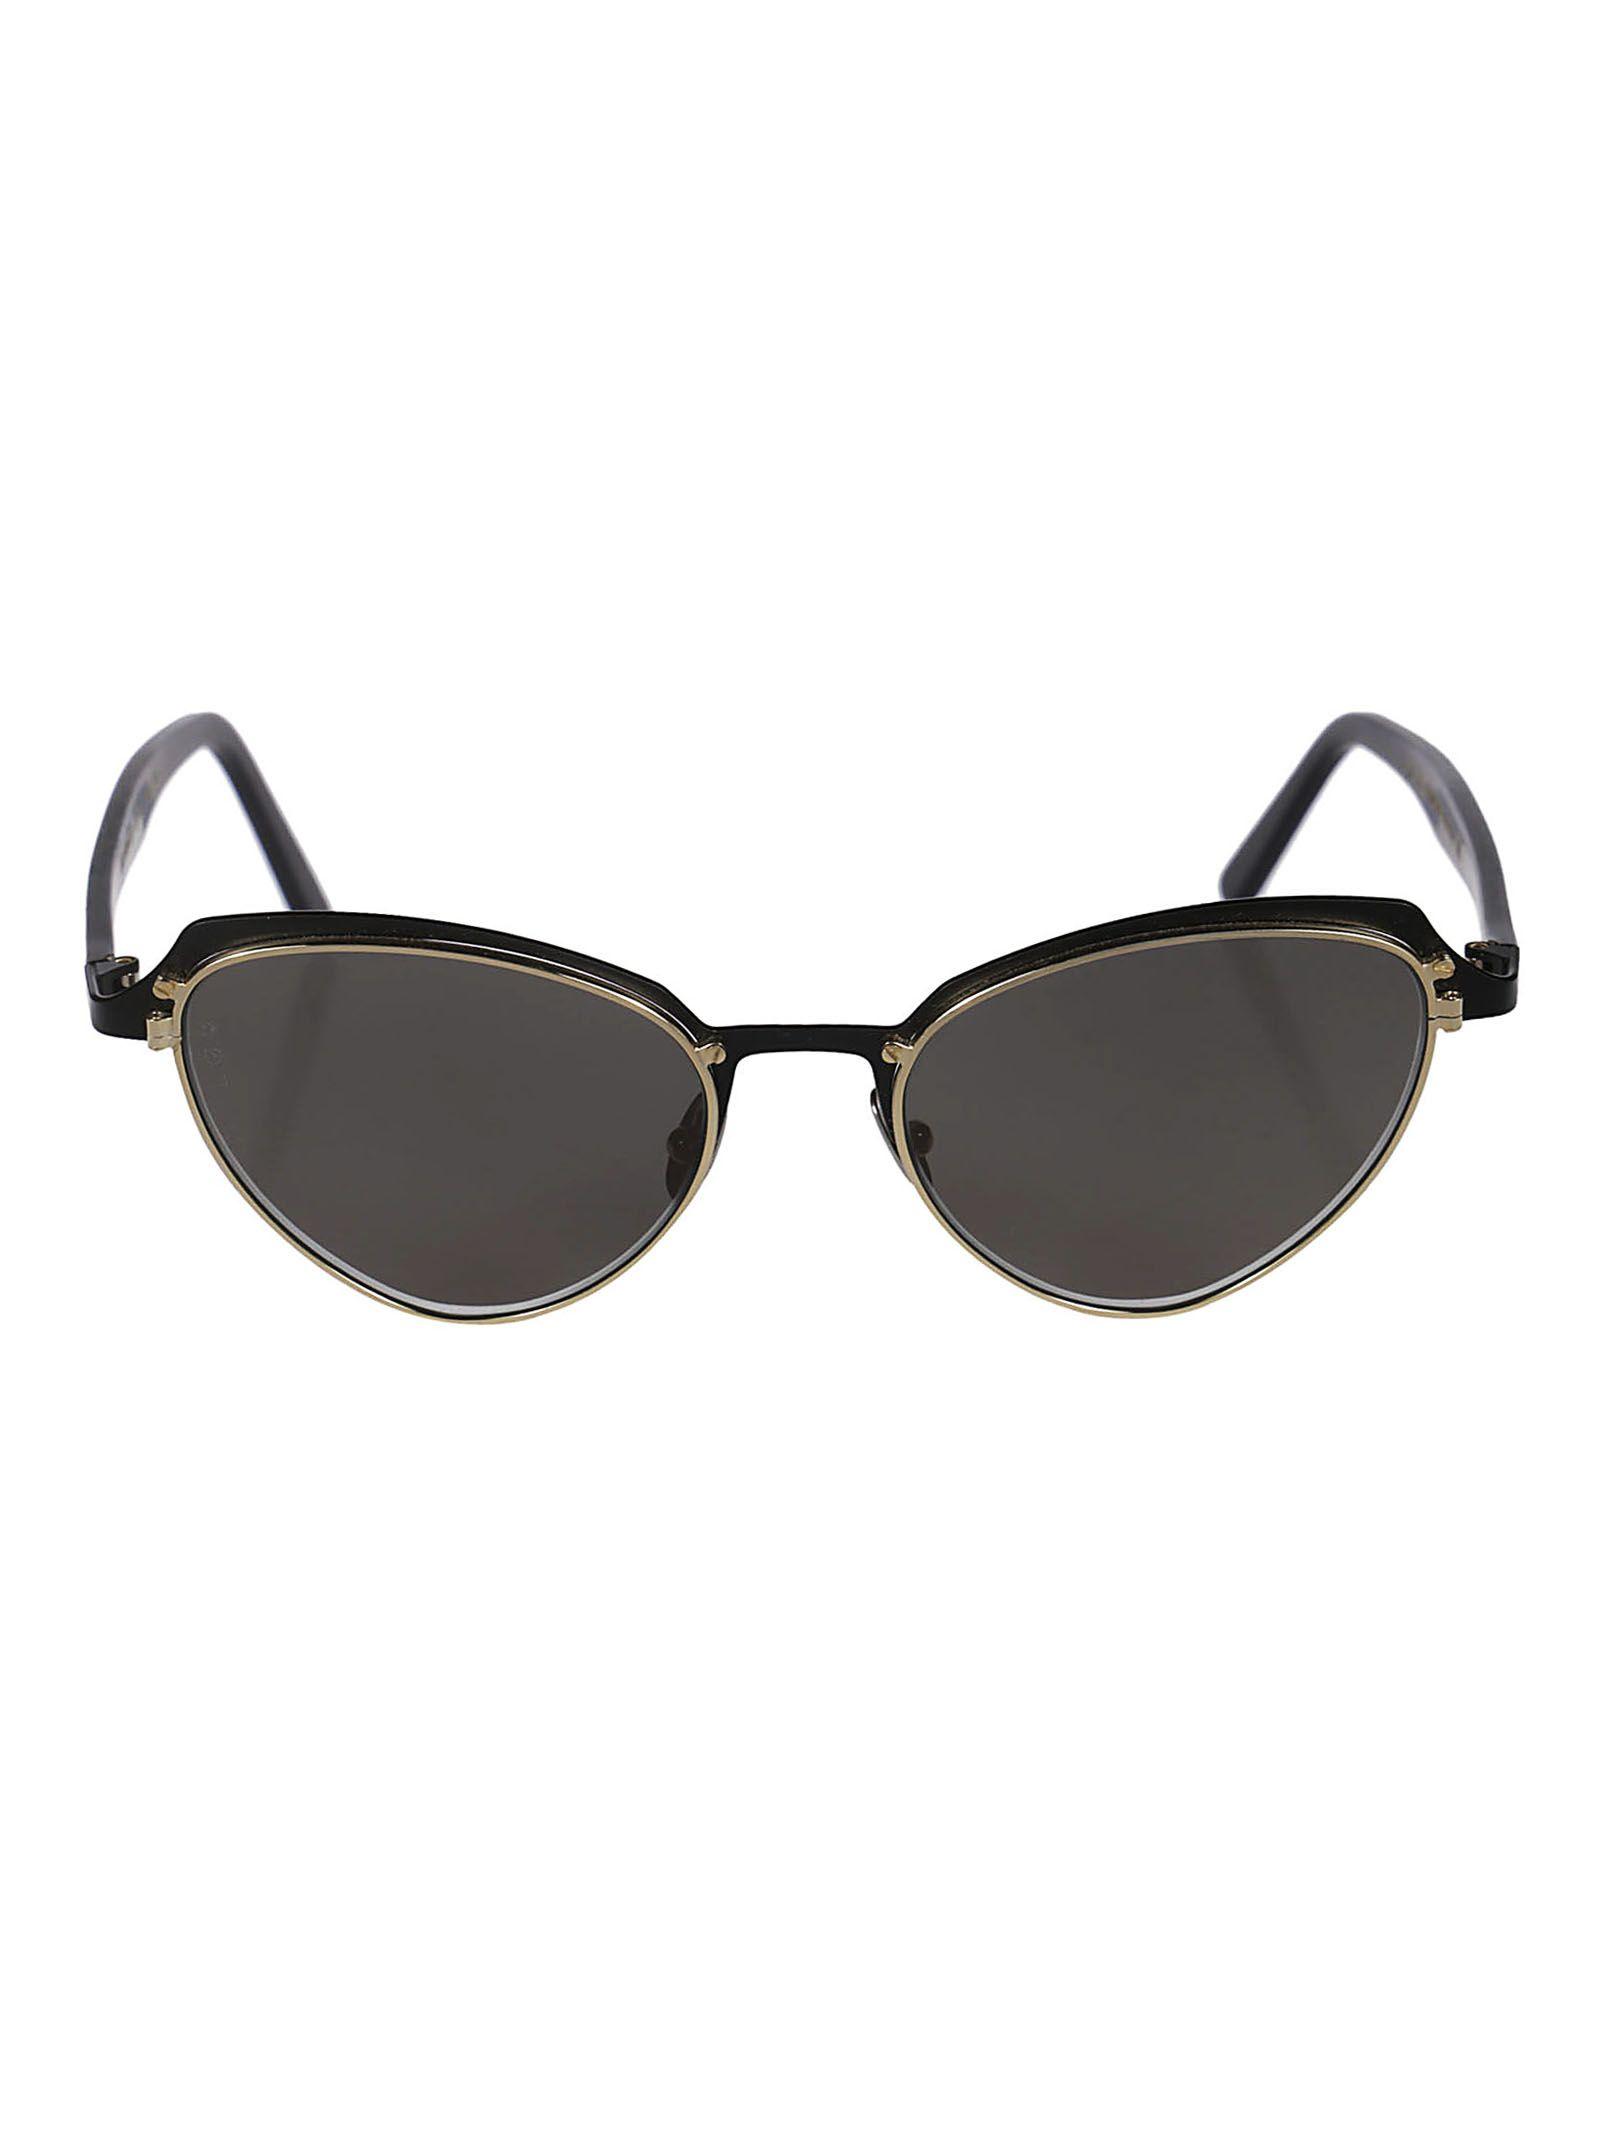 L.G.R Lgr Cat Eye Sunglasses in Black Matt